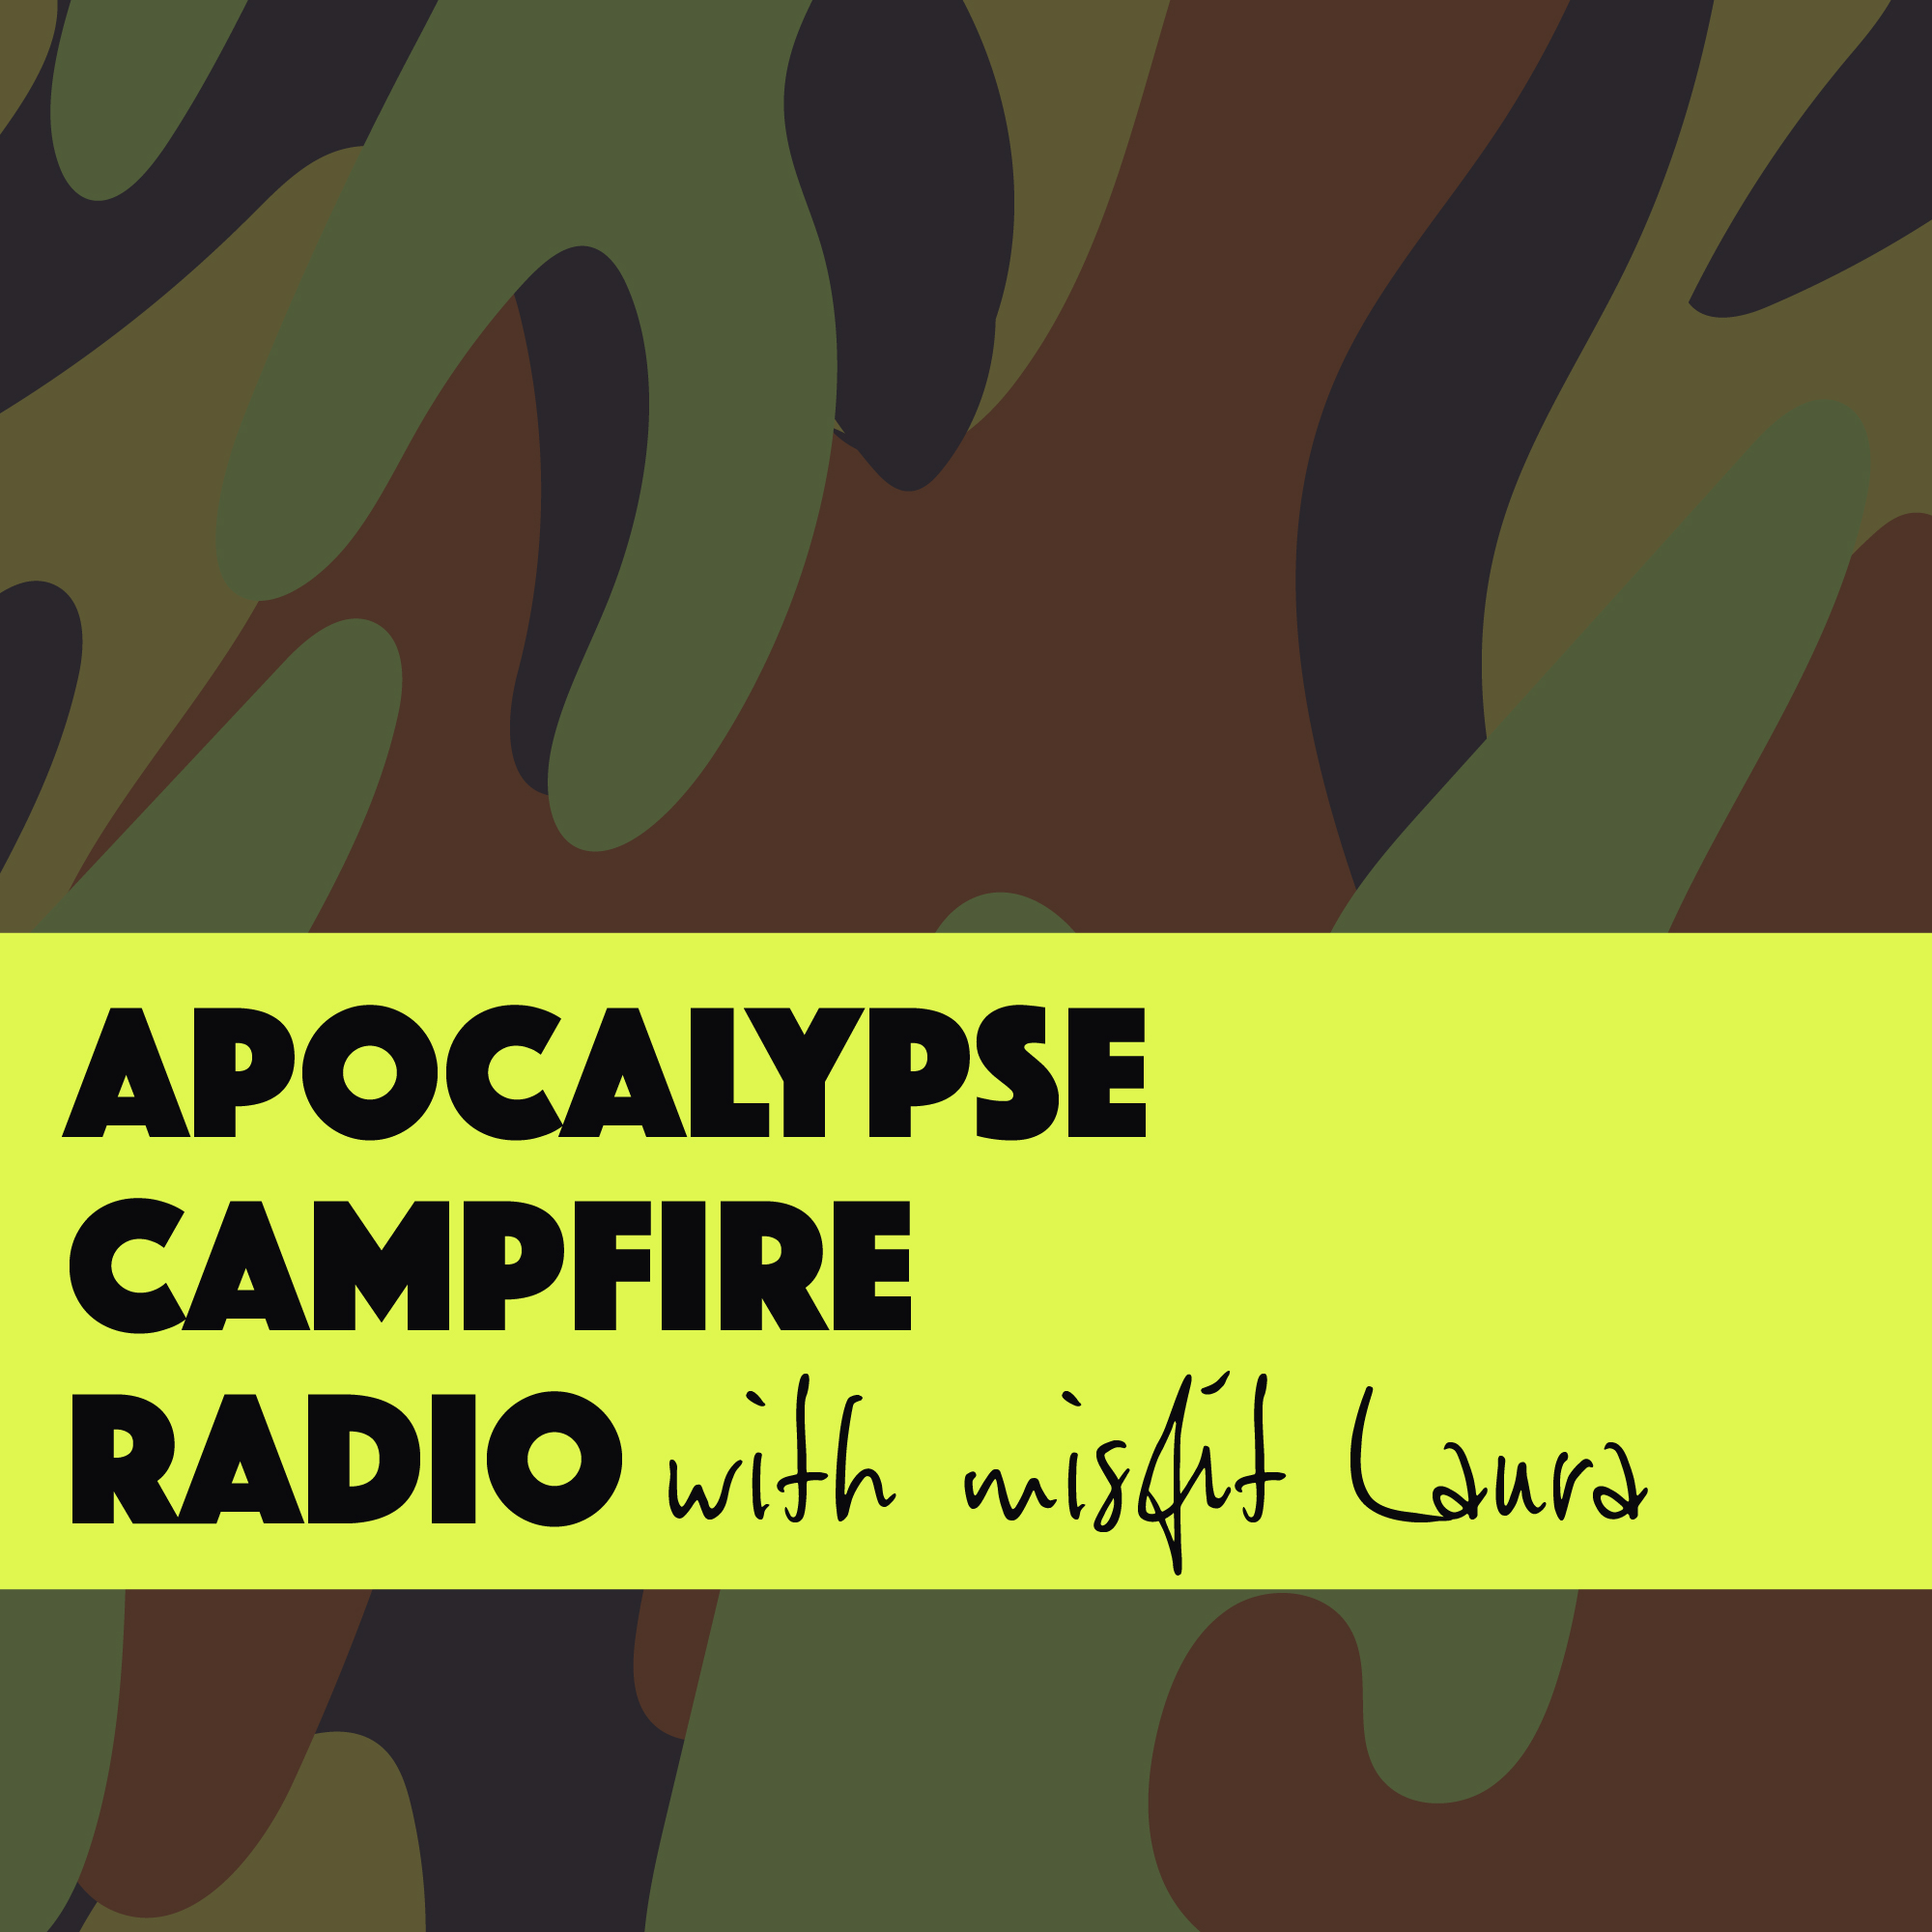 APOCALYPSE CAMPFIRE RADIO